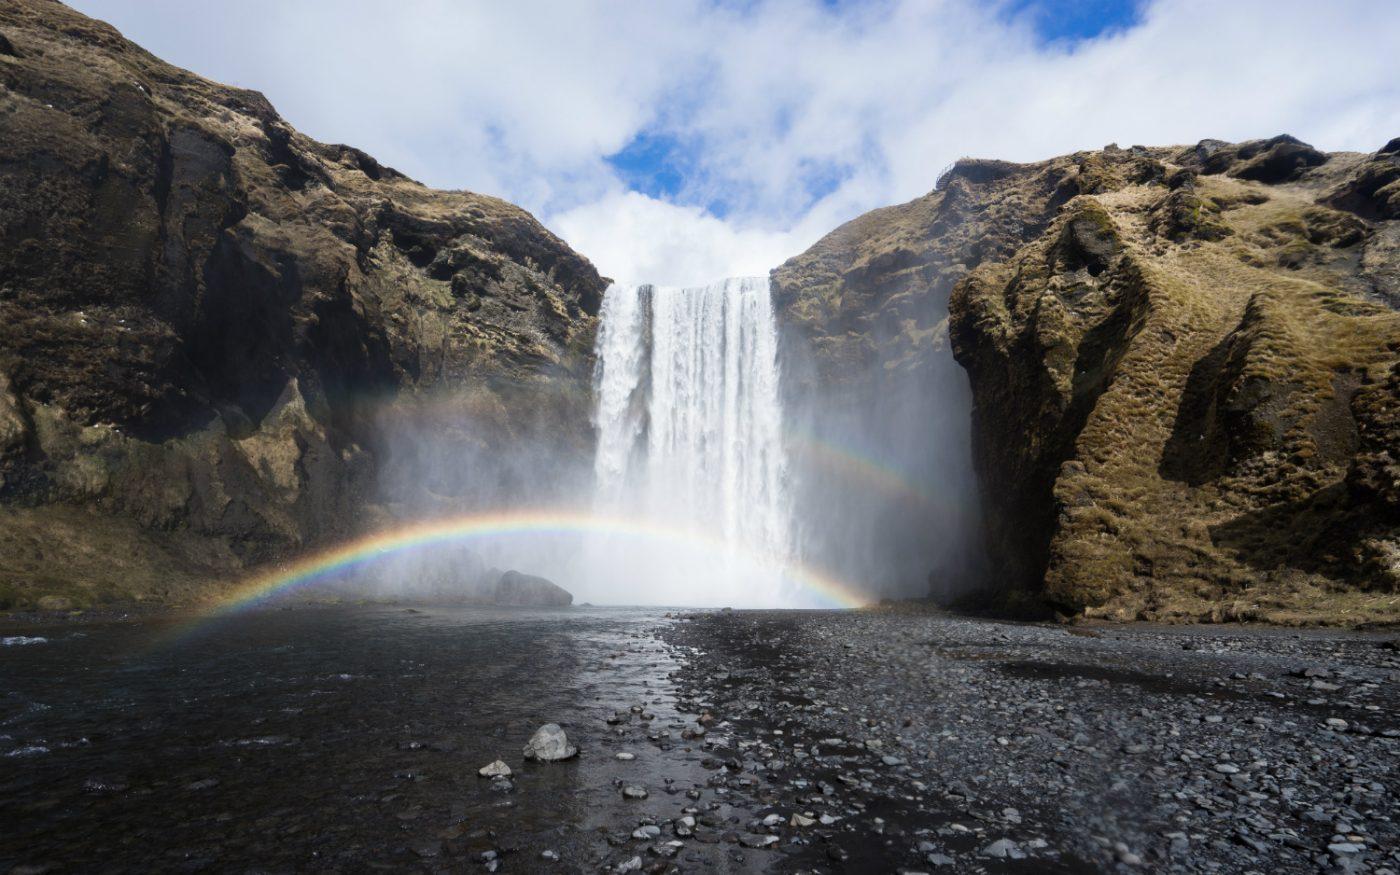 Wasserfall Seljalandsfoss und ein Regenbogen